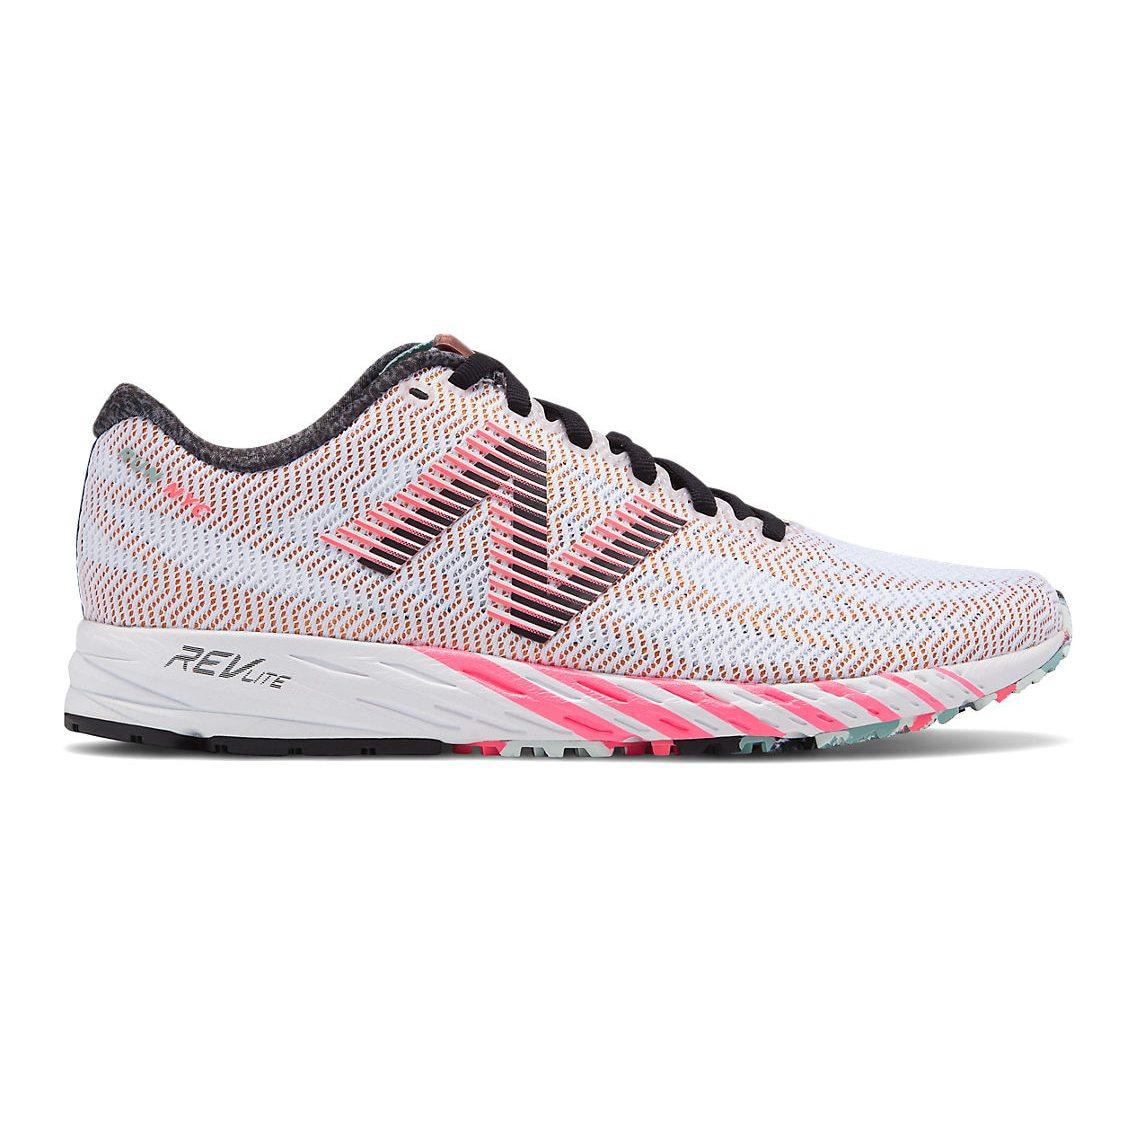 Chaussures femme New Balance 1400v6 NYC Marathon